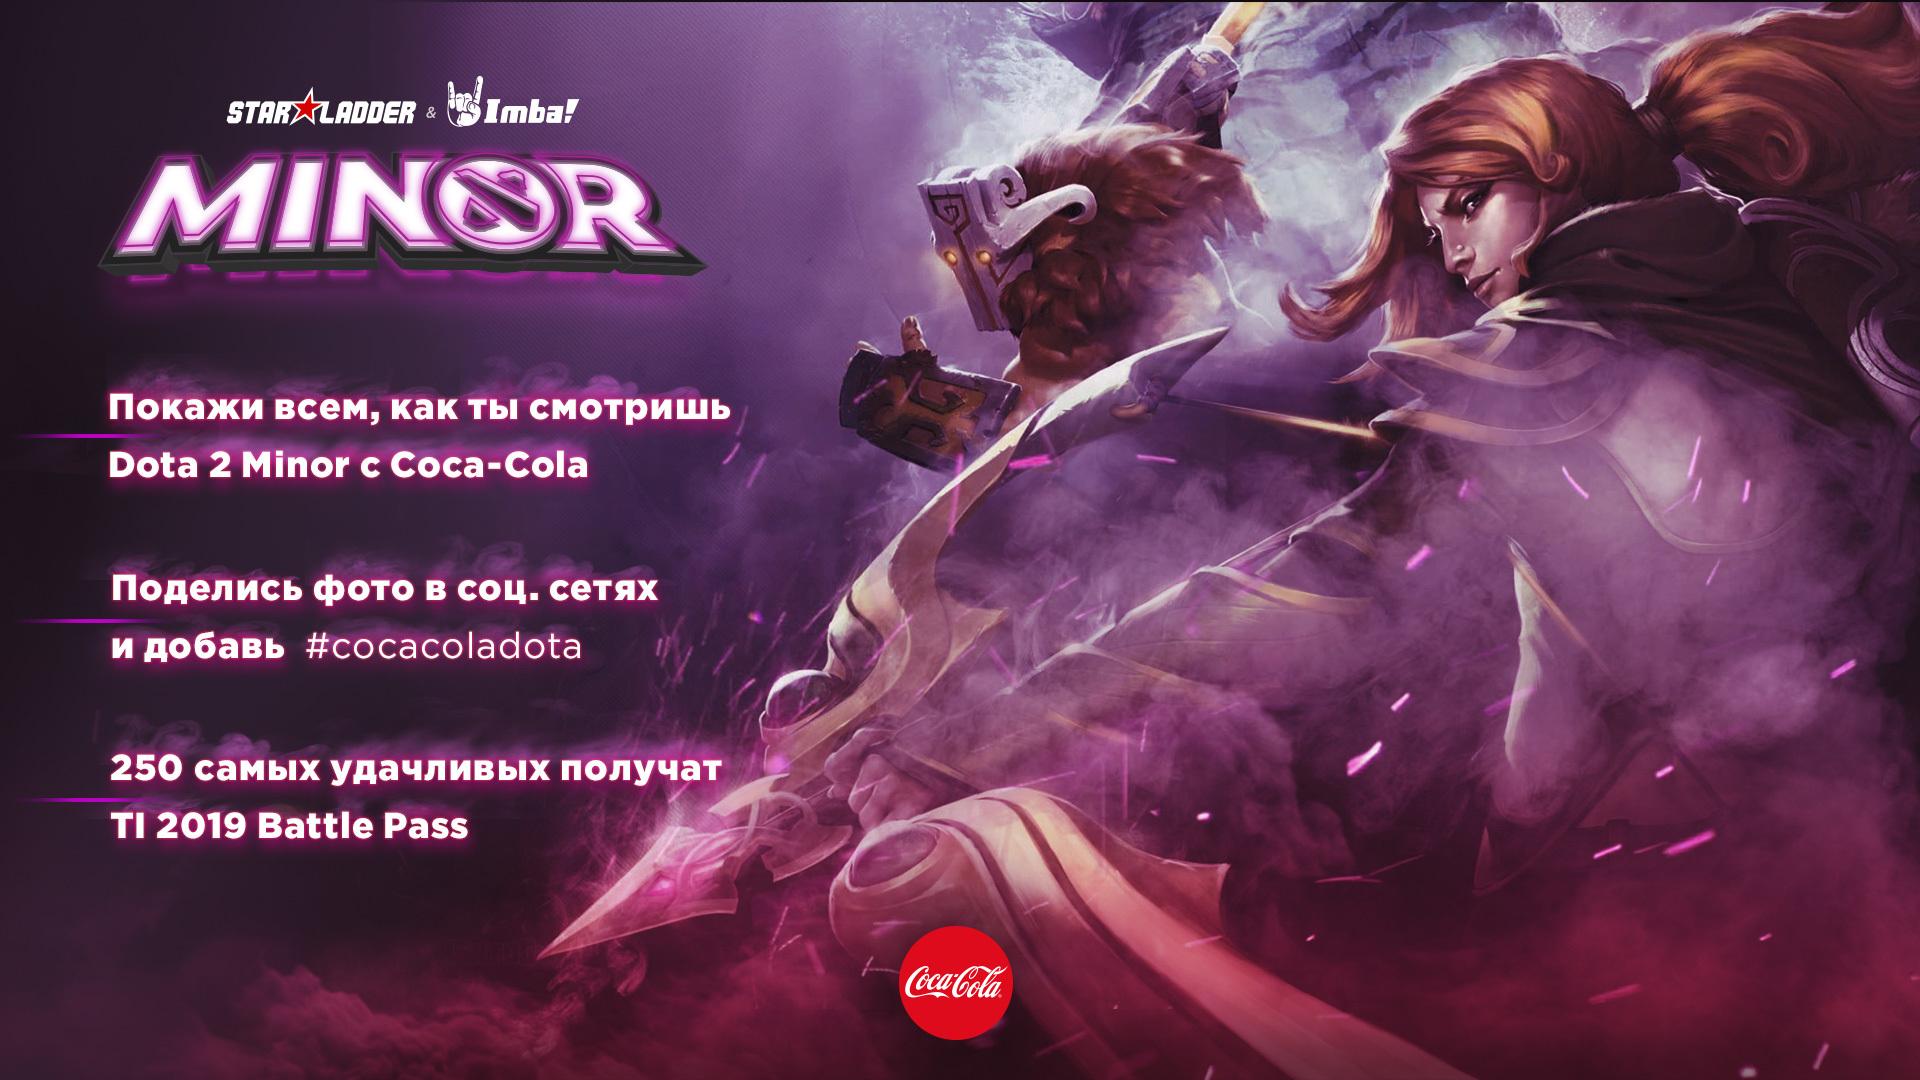 Coca-Cola подарит Battle Pass зрителям StarLadder Dota 2 Minor